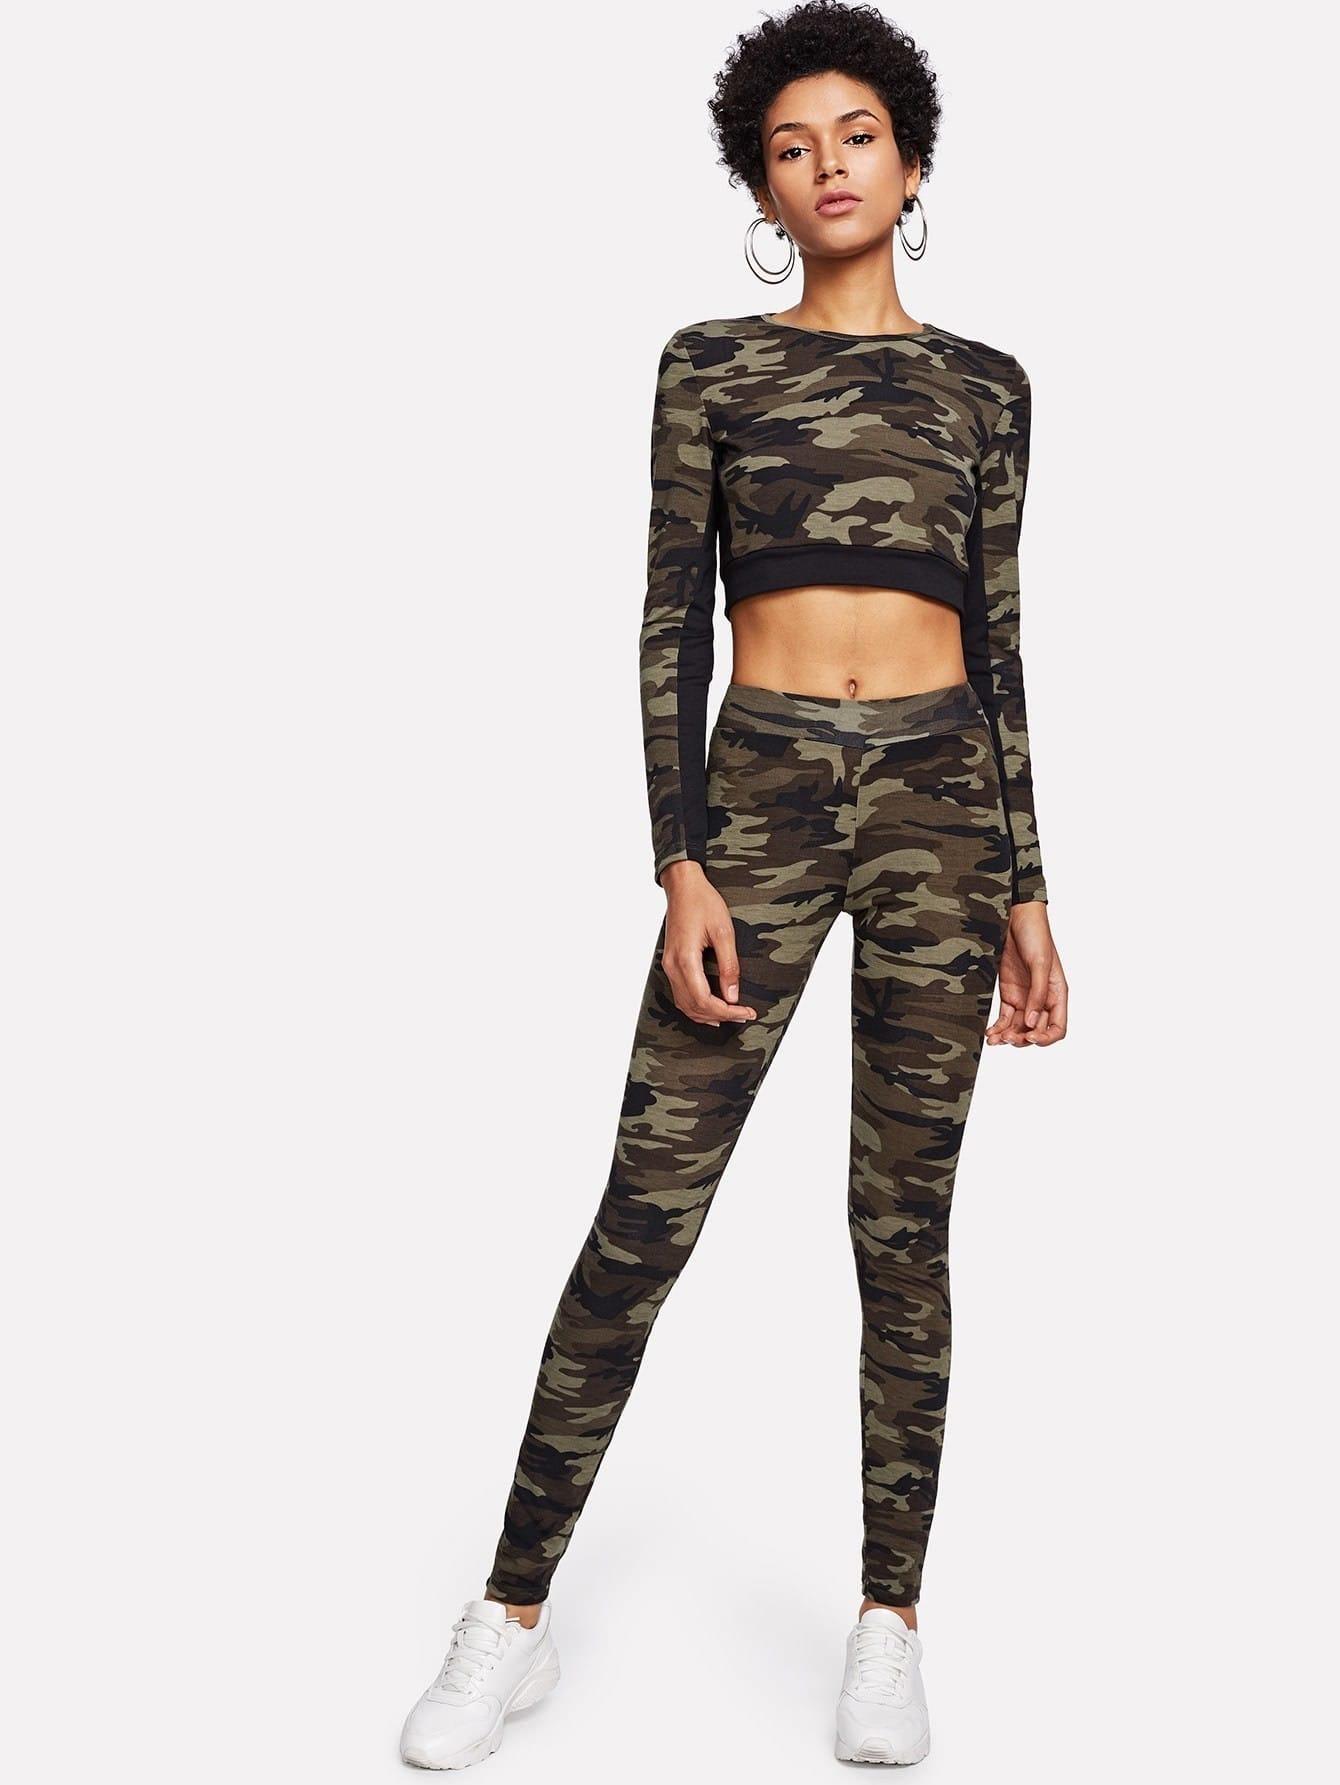 Camo Print Crop Top & Leggings Set letter print tape crop top with leggings set